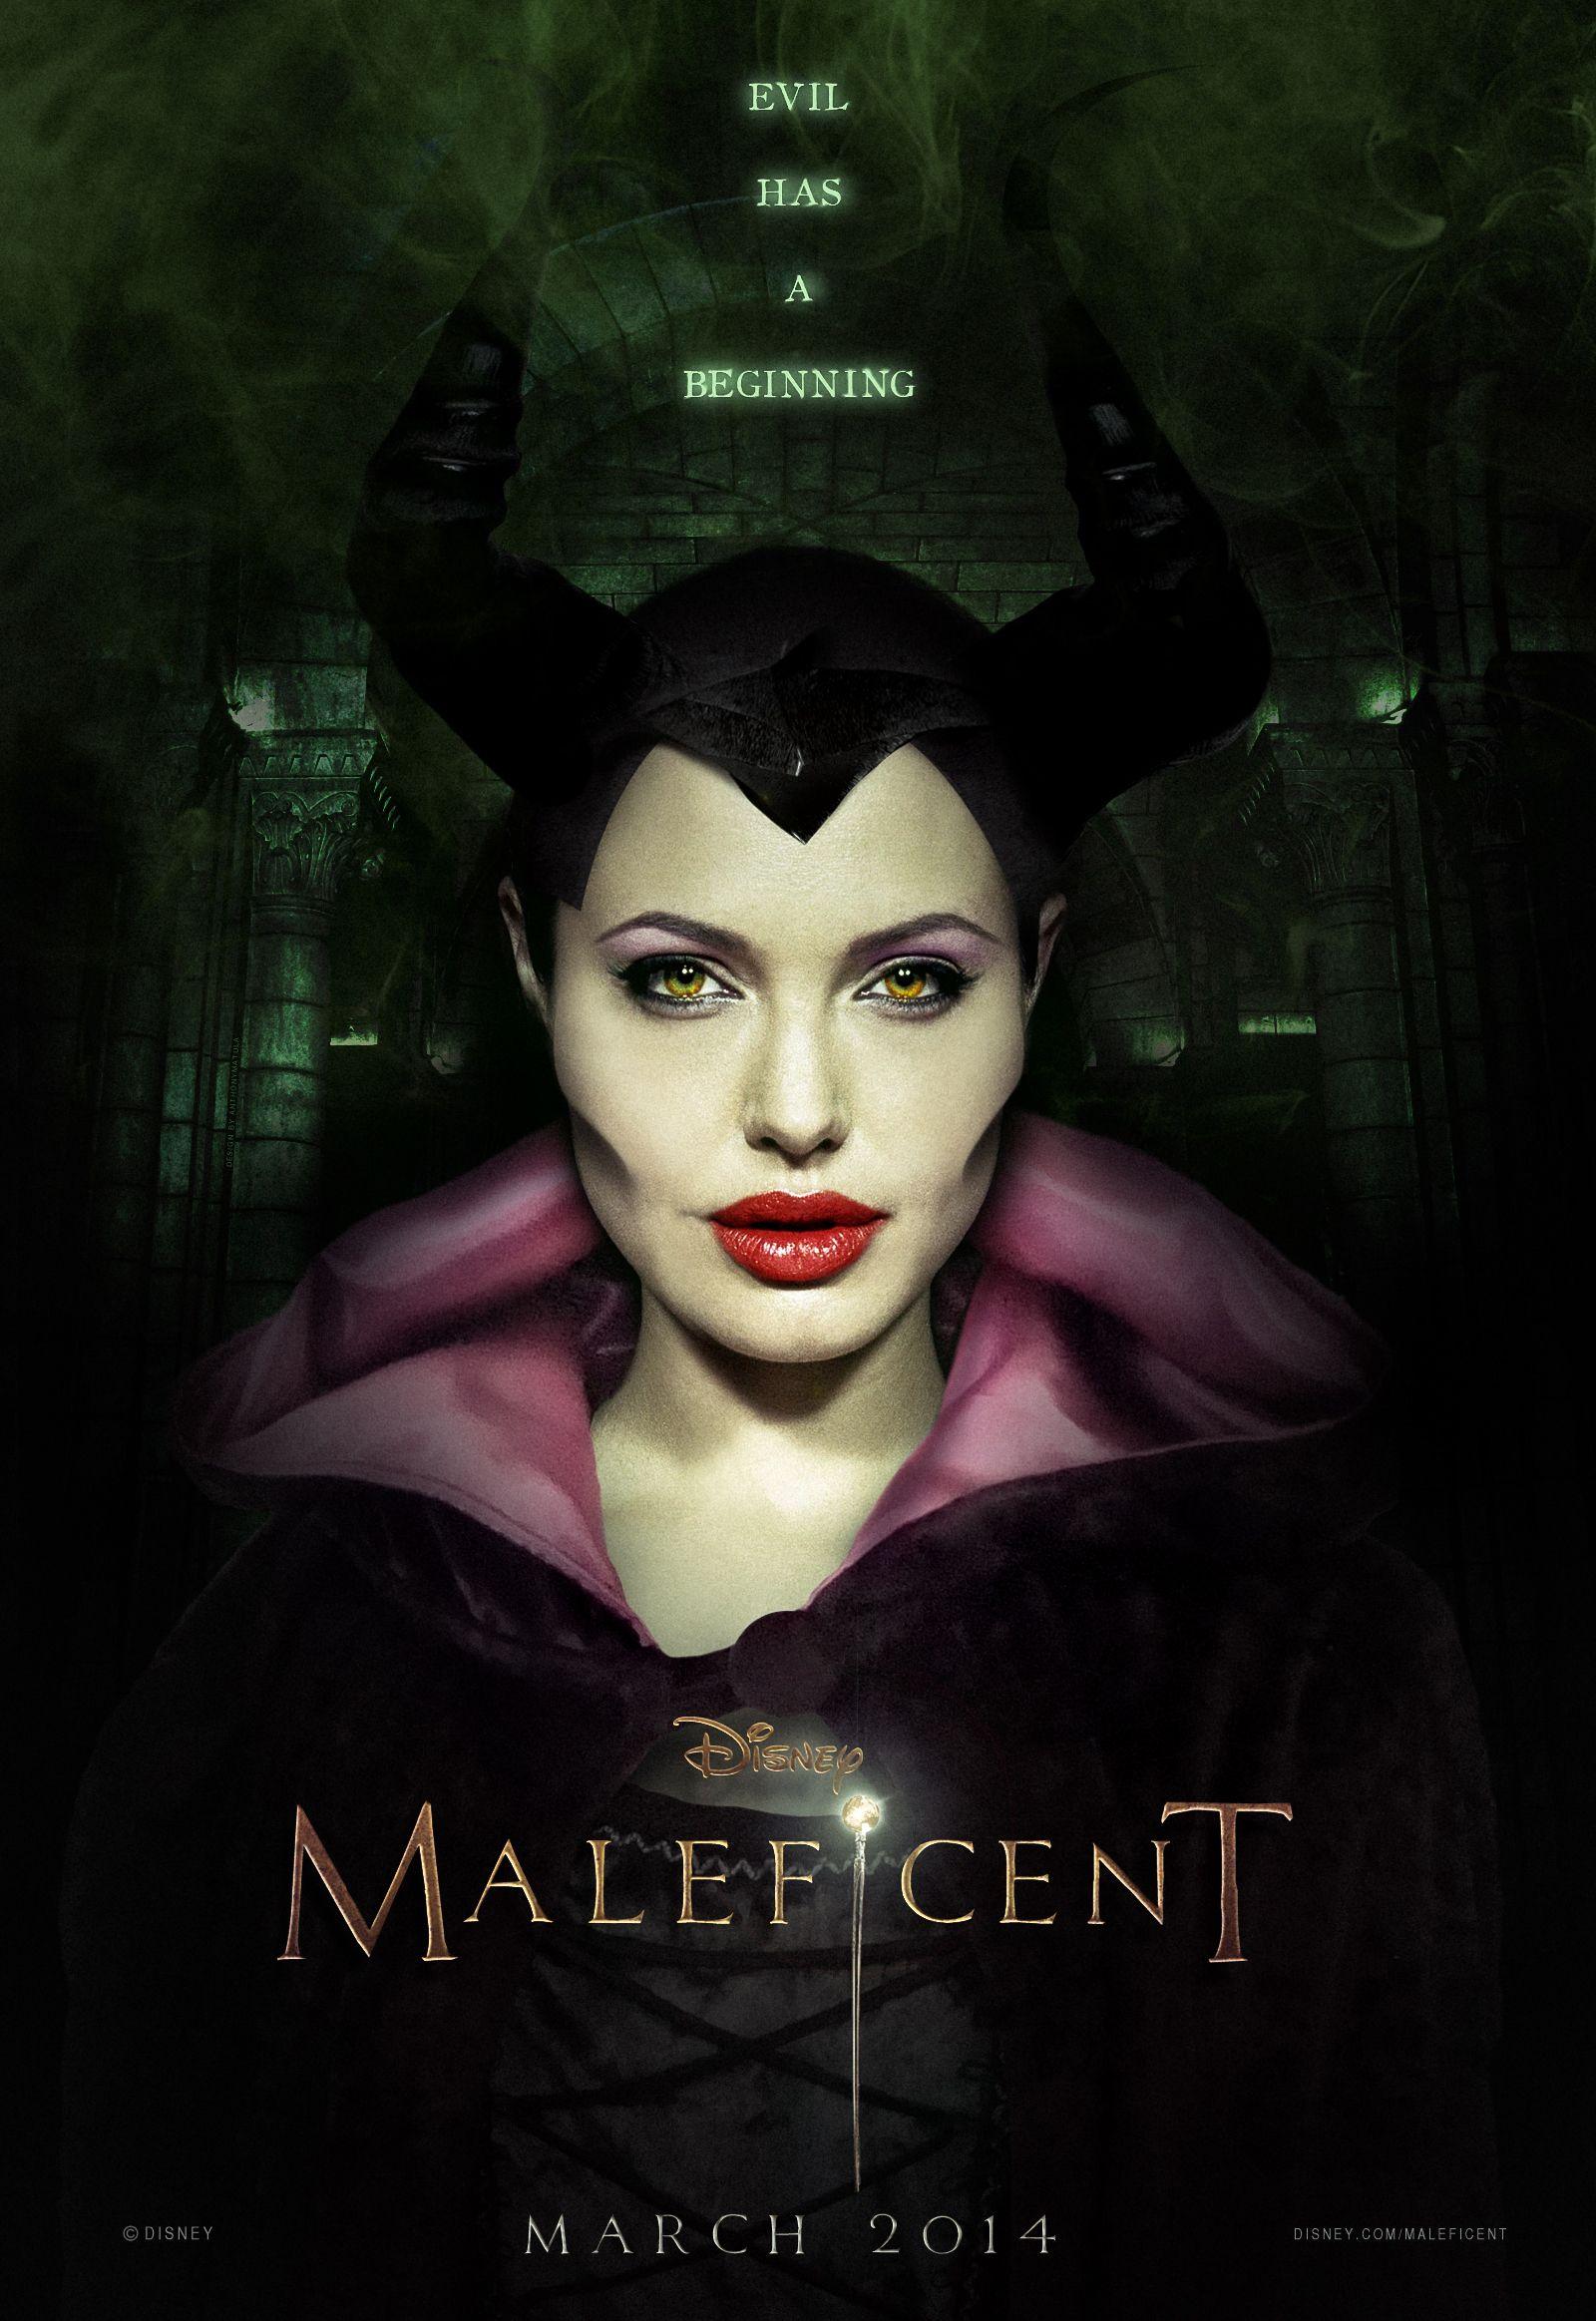 Maleficent (Angelina Jolie - 2014)   Malegica   Pinterest   Poster ...